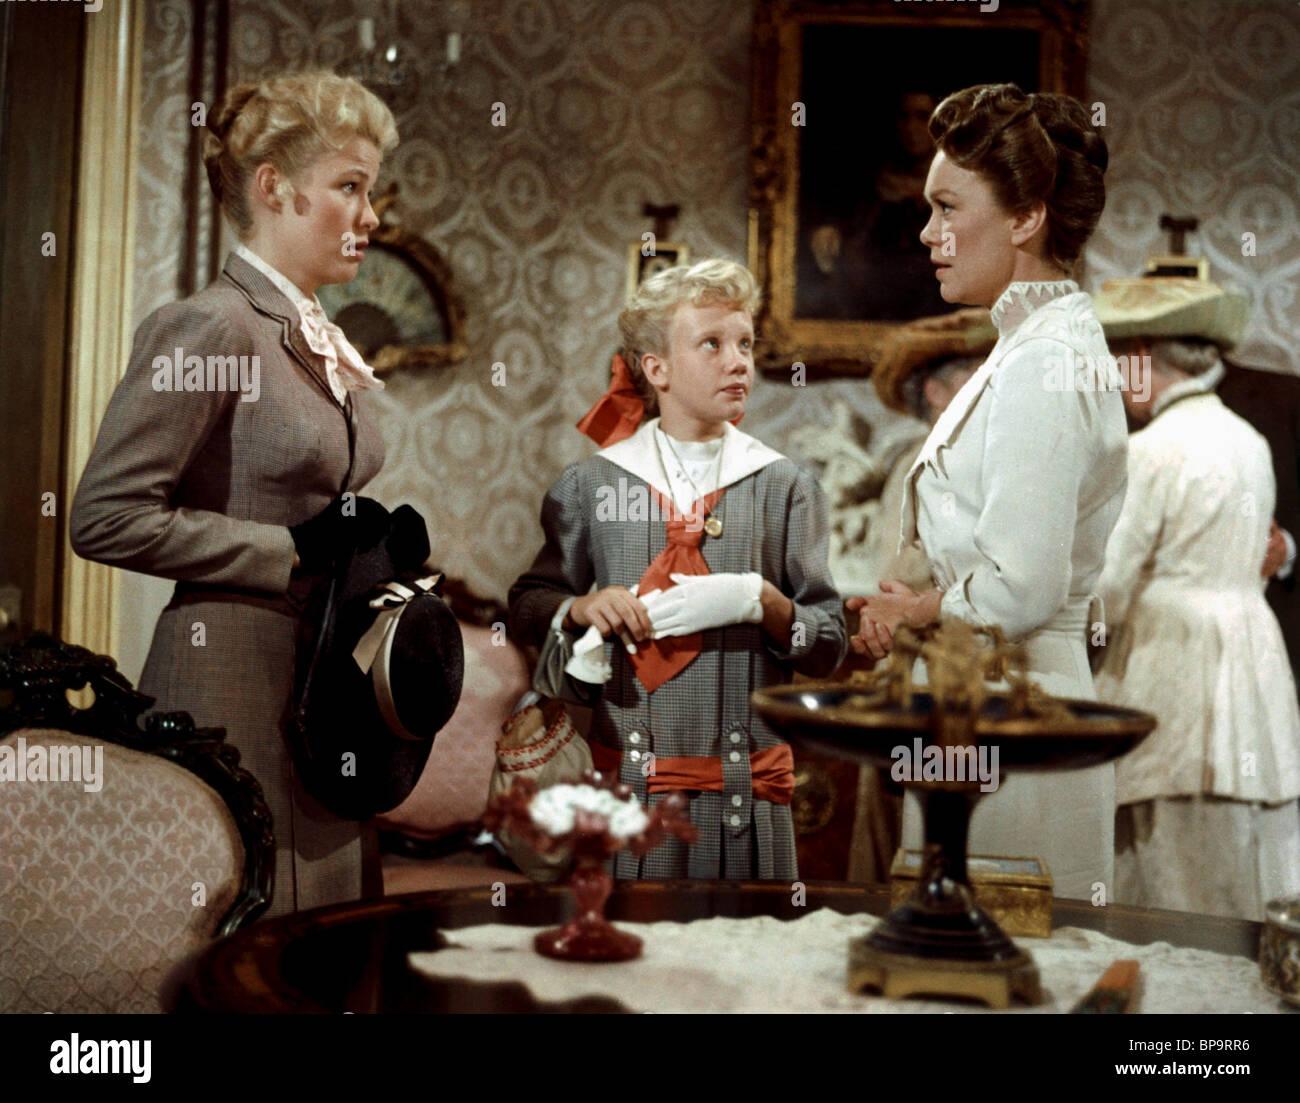 NANCY OLSON, HAYLEY MILLS, JANE WYMAN, POLLYANNA, 1960 - Stock Image